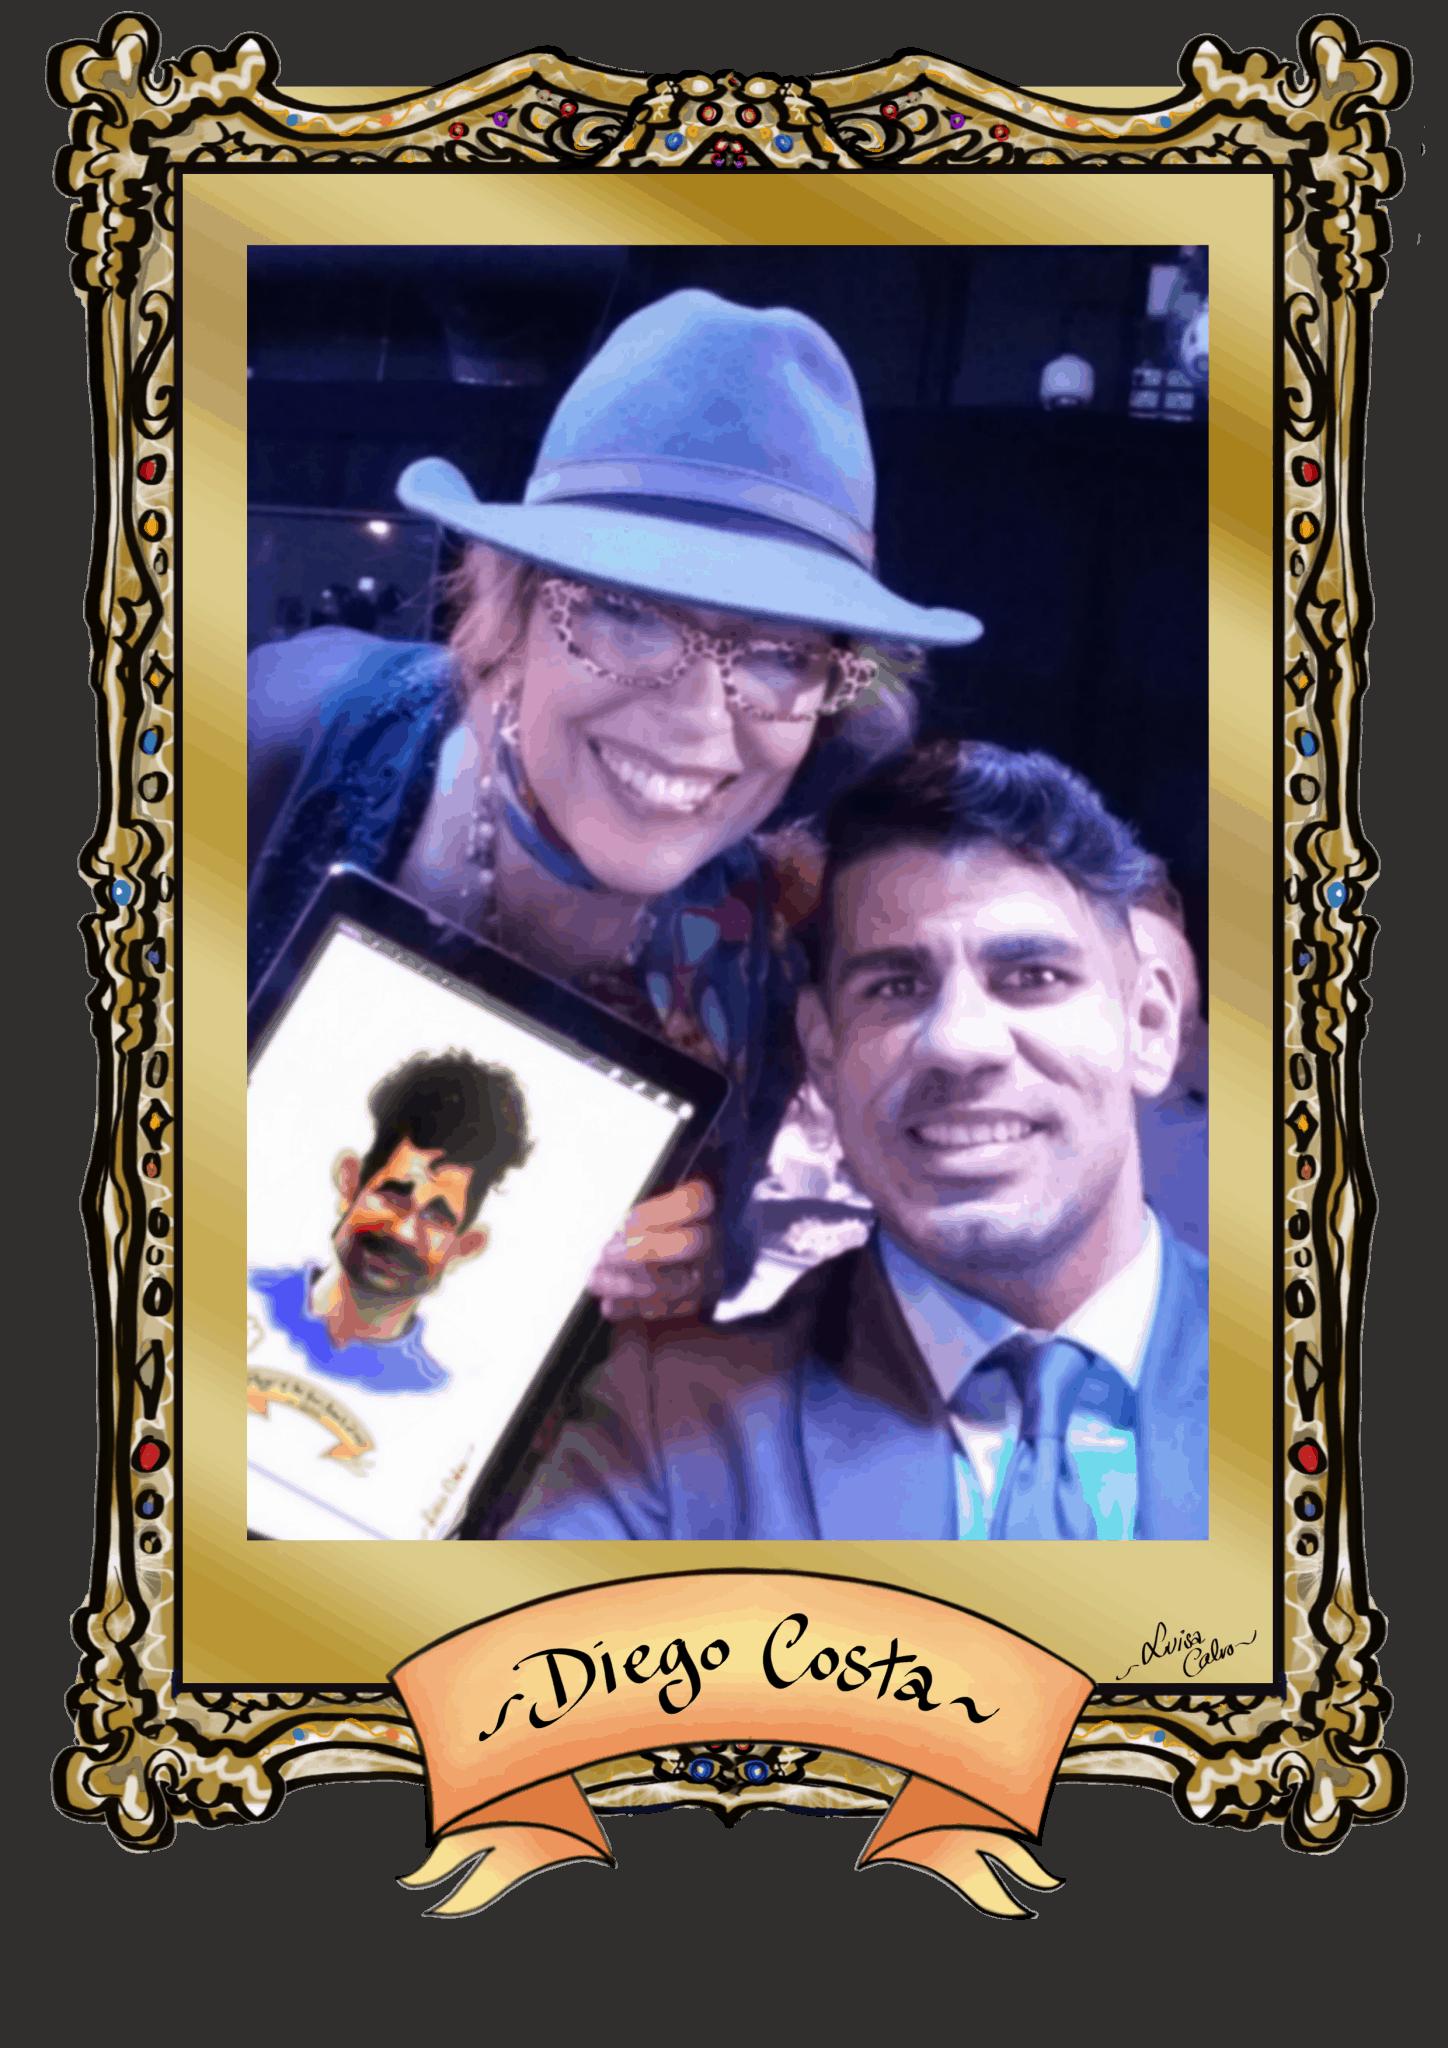 DIEGO COSTA – DRAWN BY LUISA CALVO AT THE EMIRATES STADIUM